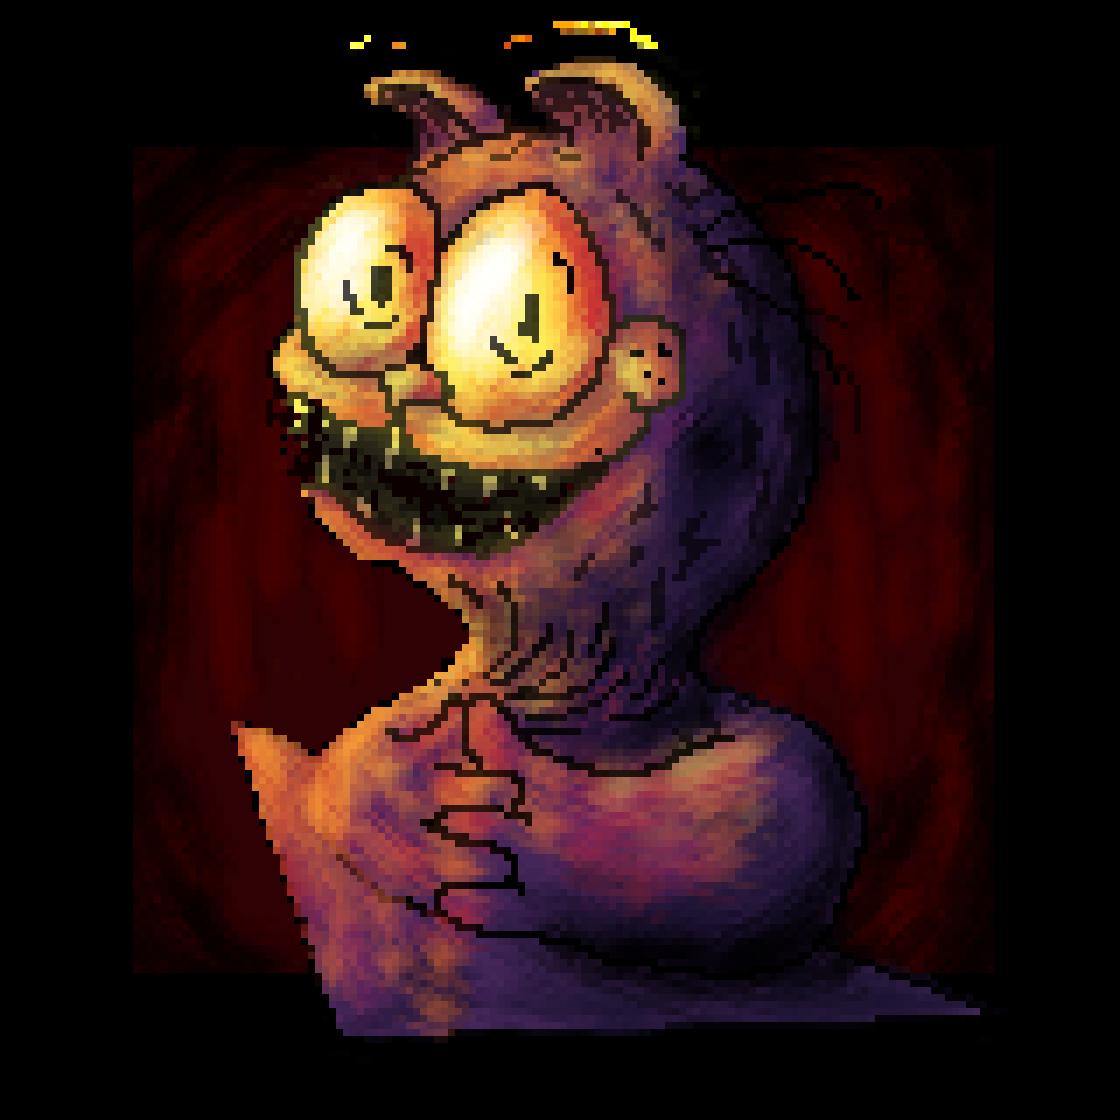 Garfield Contest entry: Let's talk John